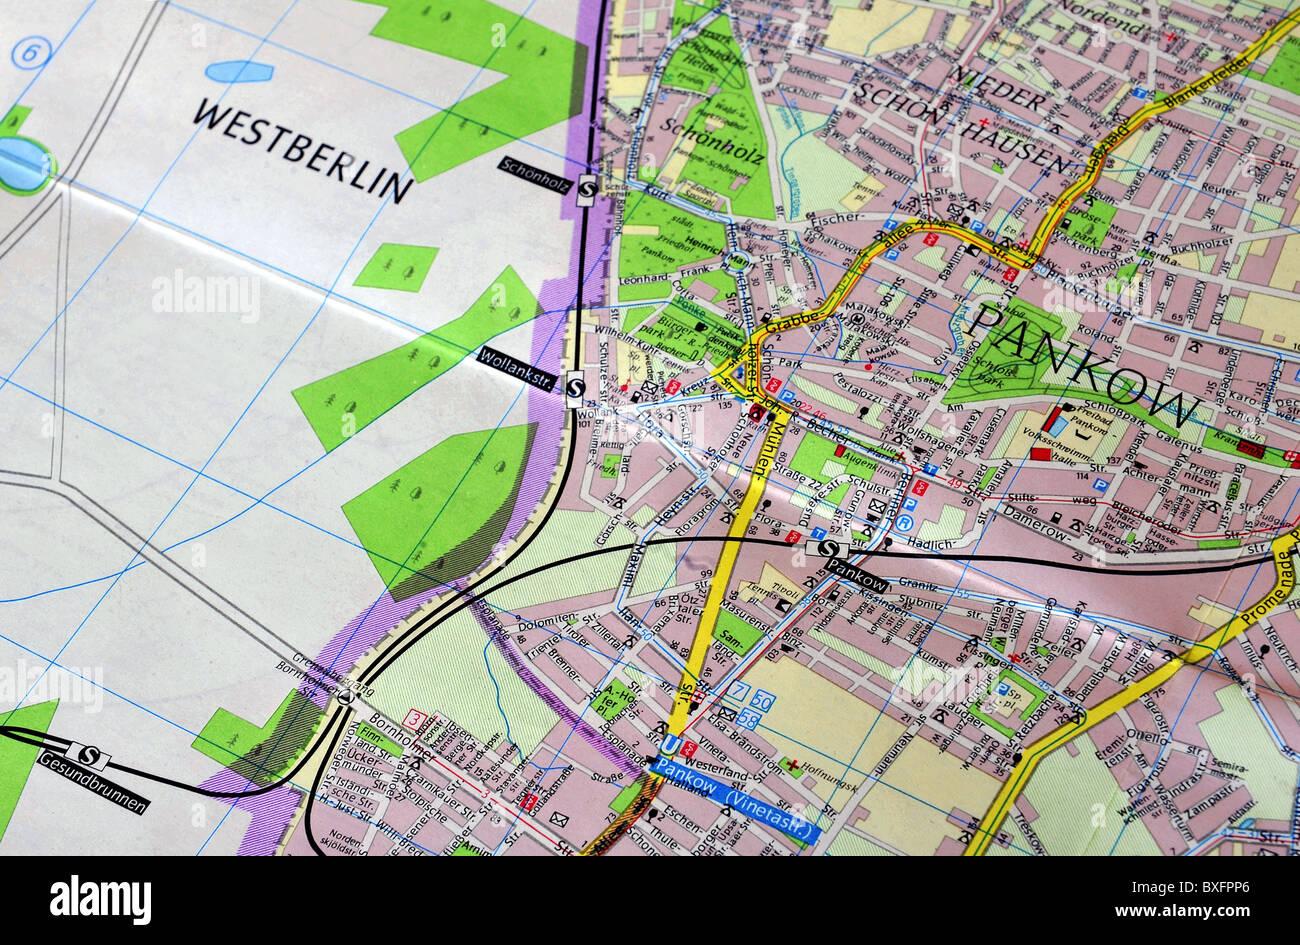 Cartography Political Maps GDR City Map Of Berlin EastBerlin - Berlin map east west